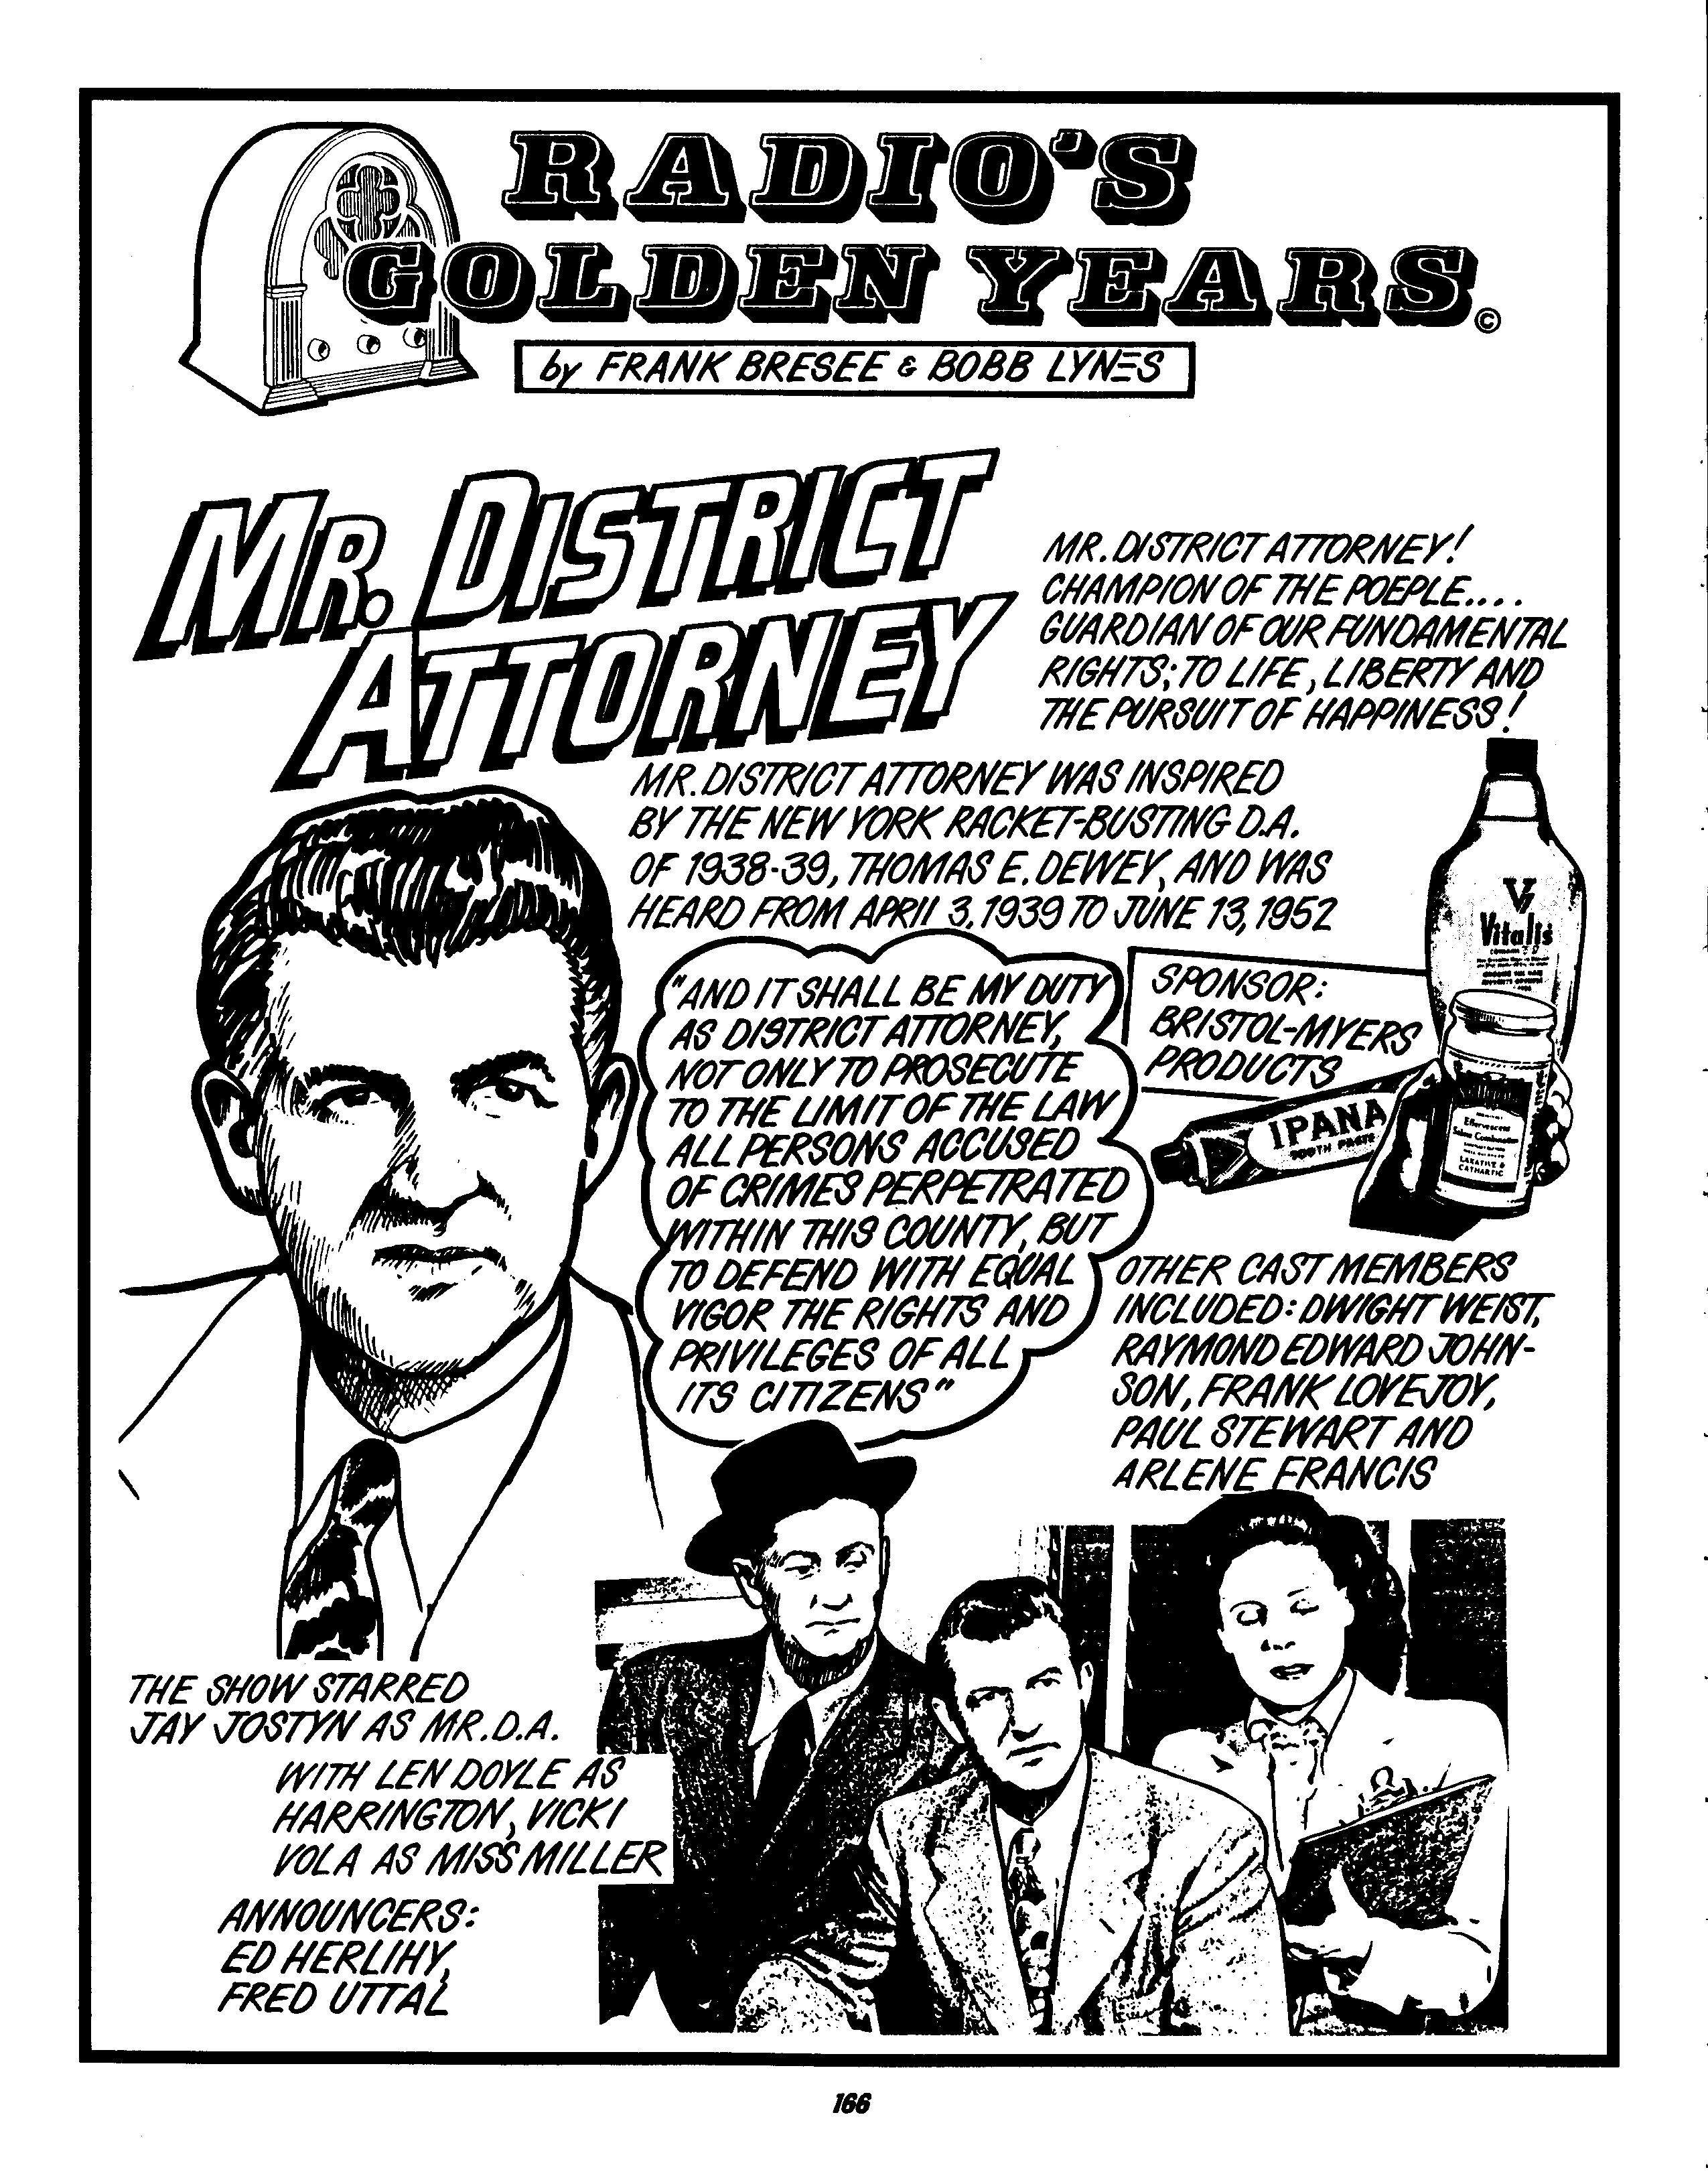 Mr District Attorney